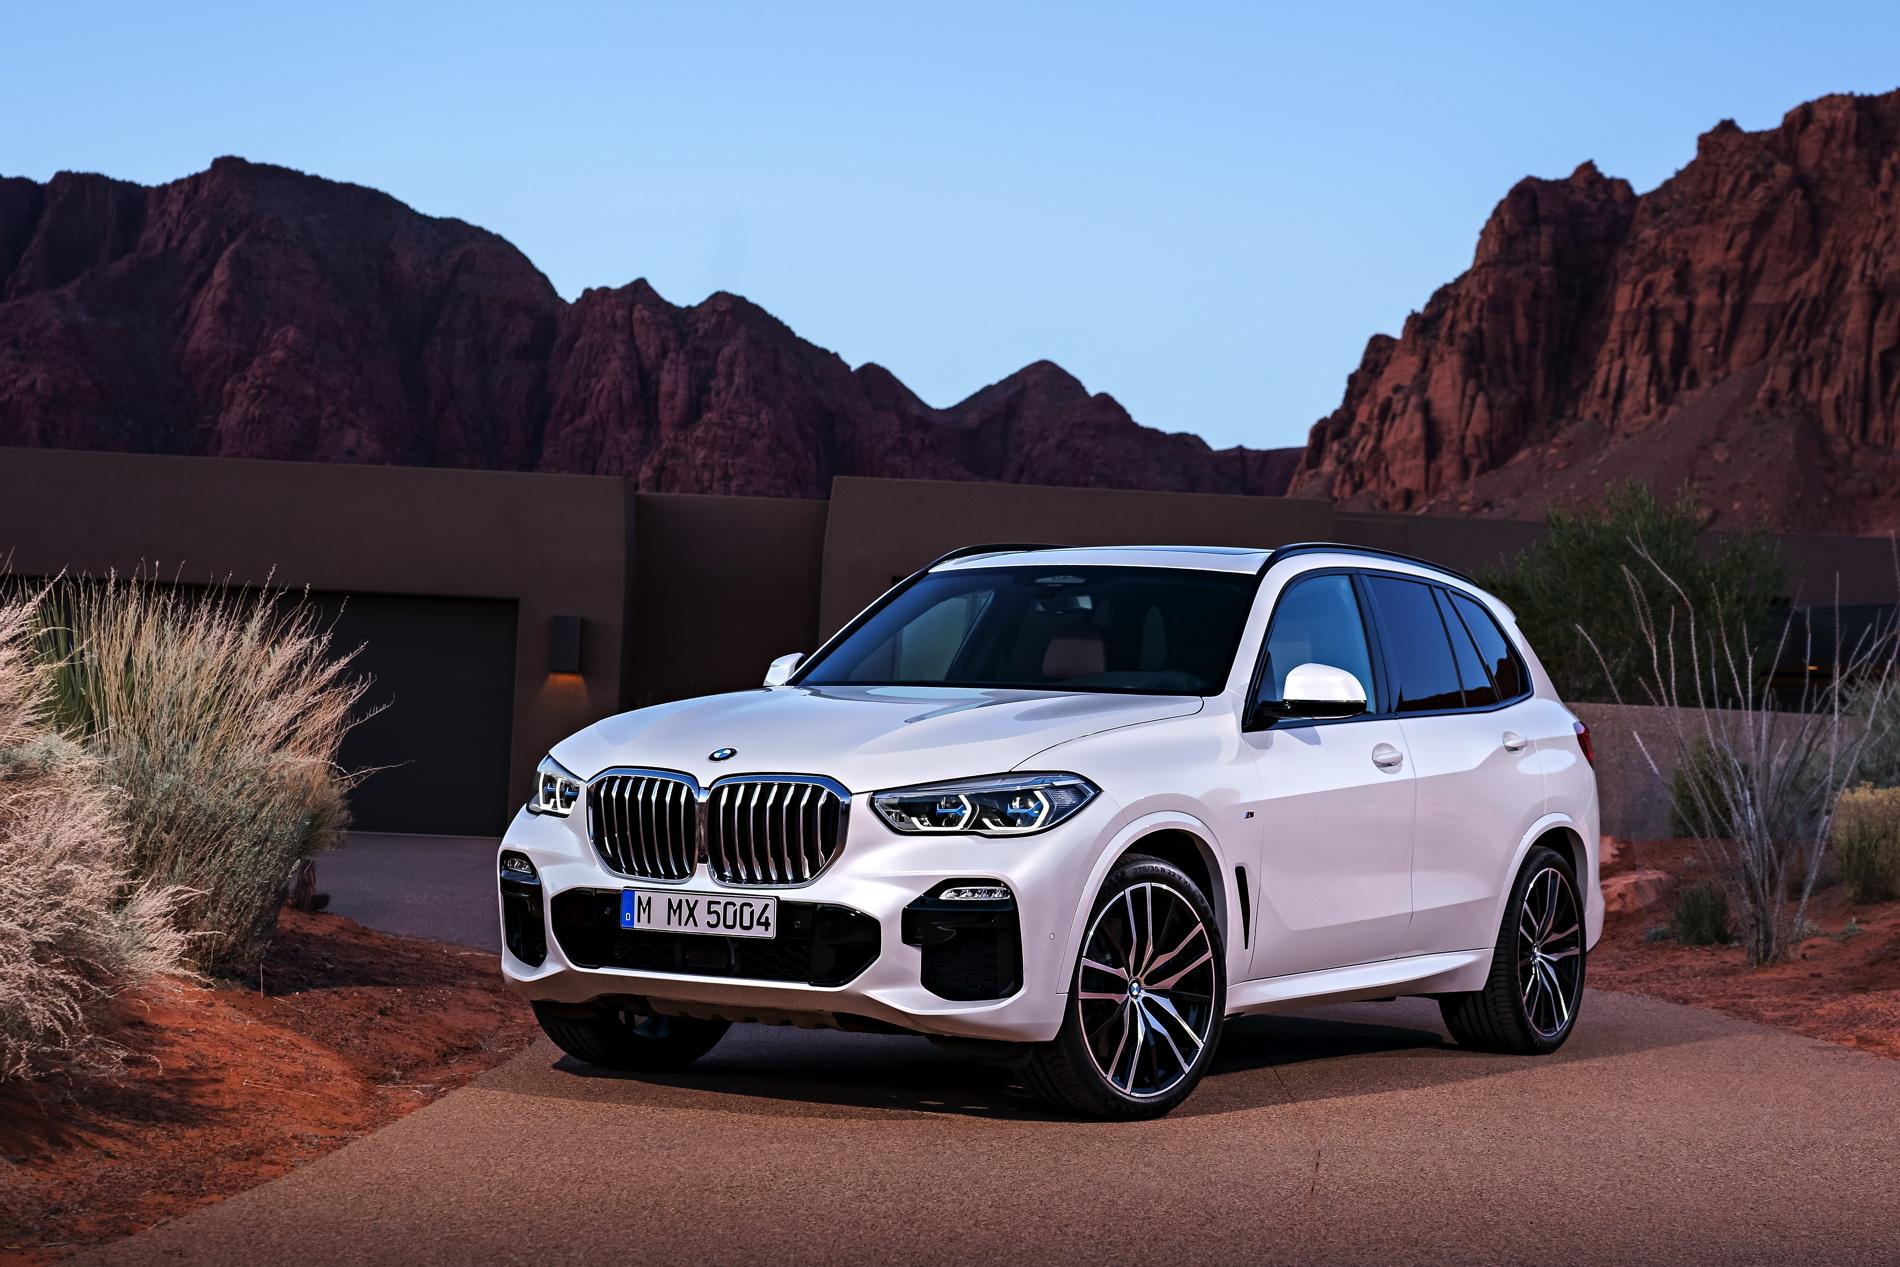 2018 BMW G05 X5 exterior 30